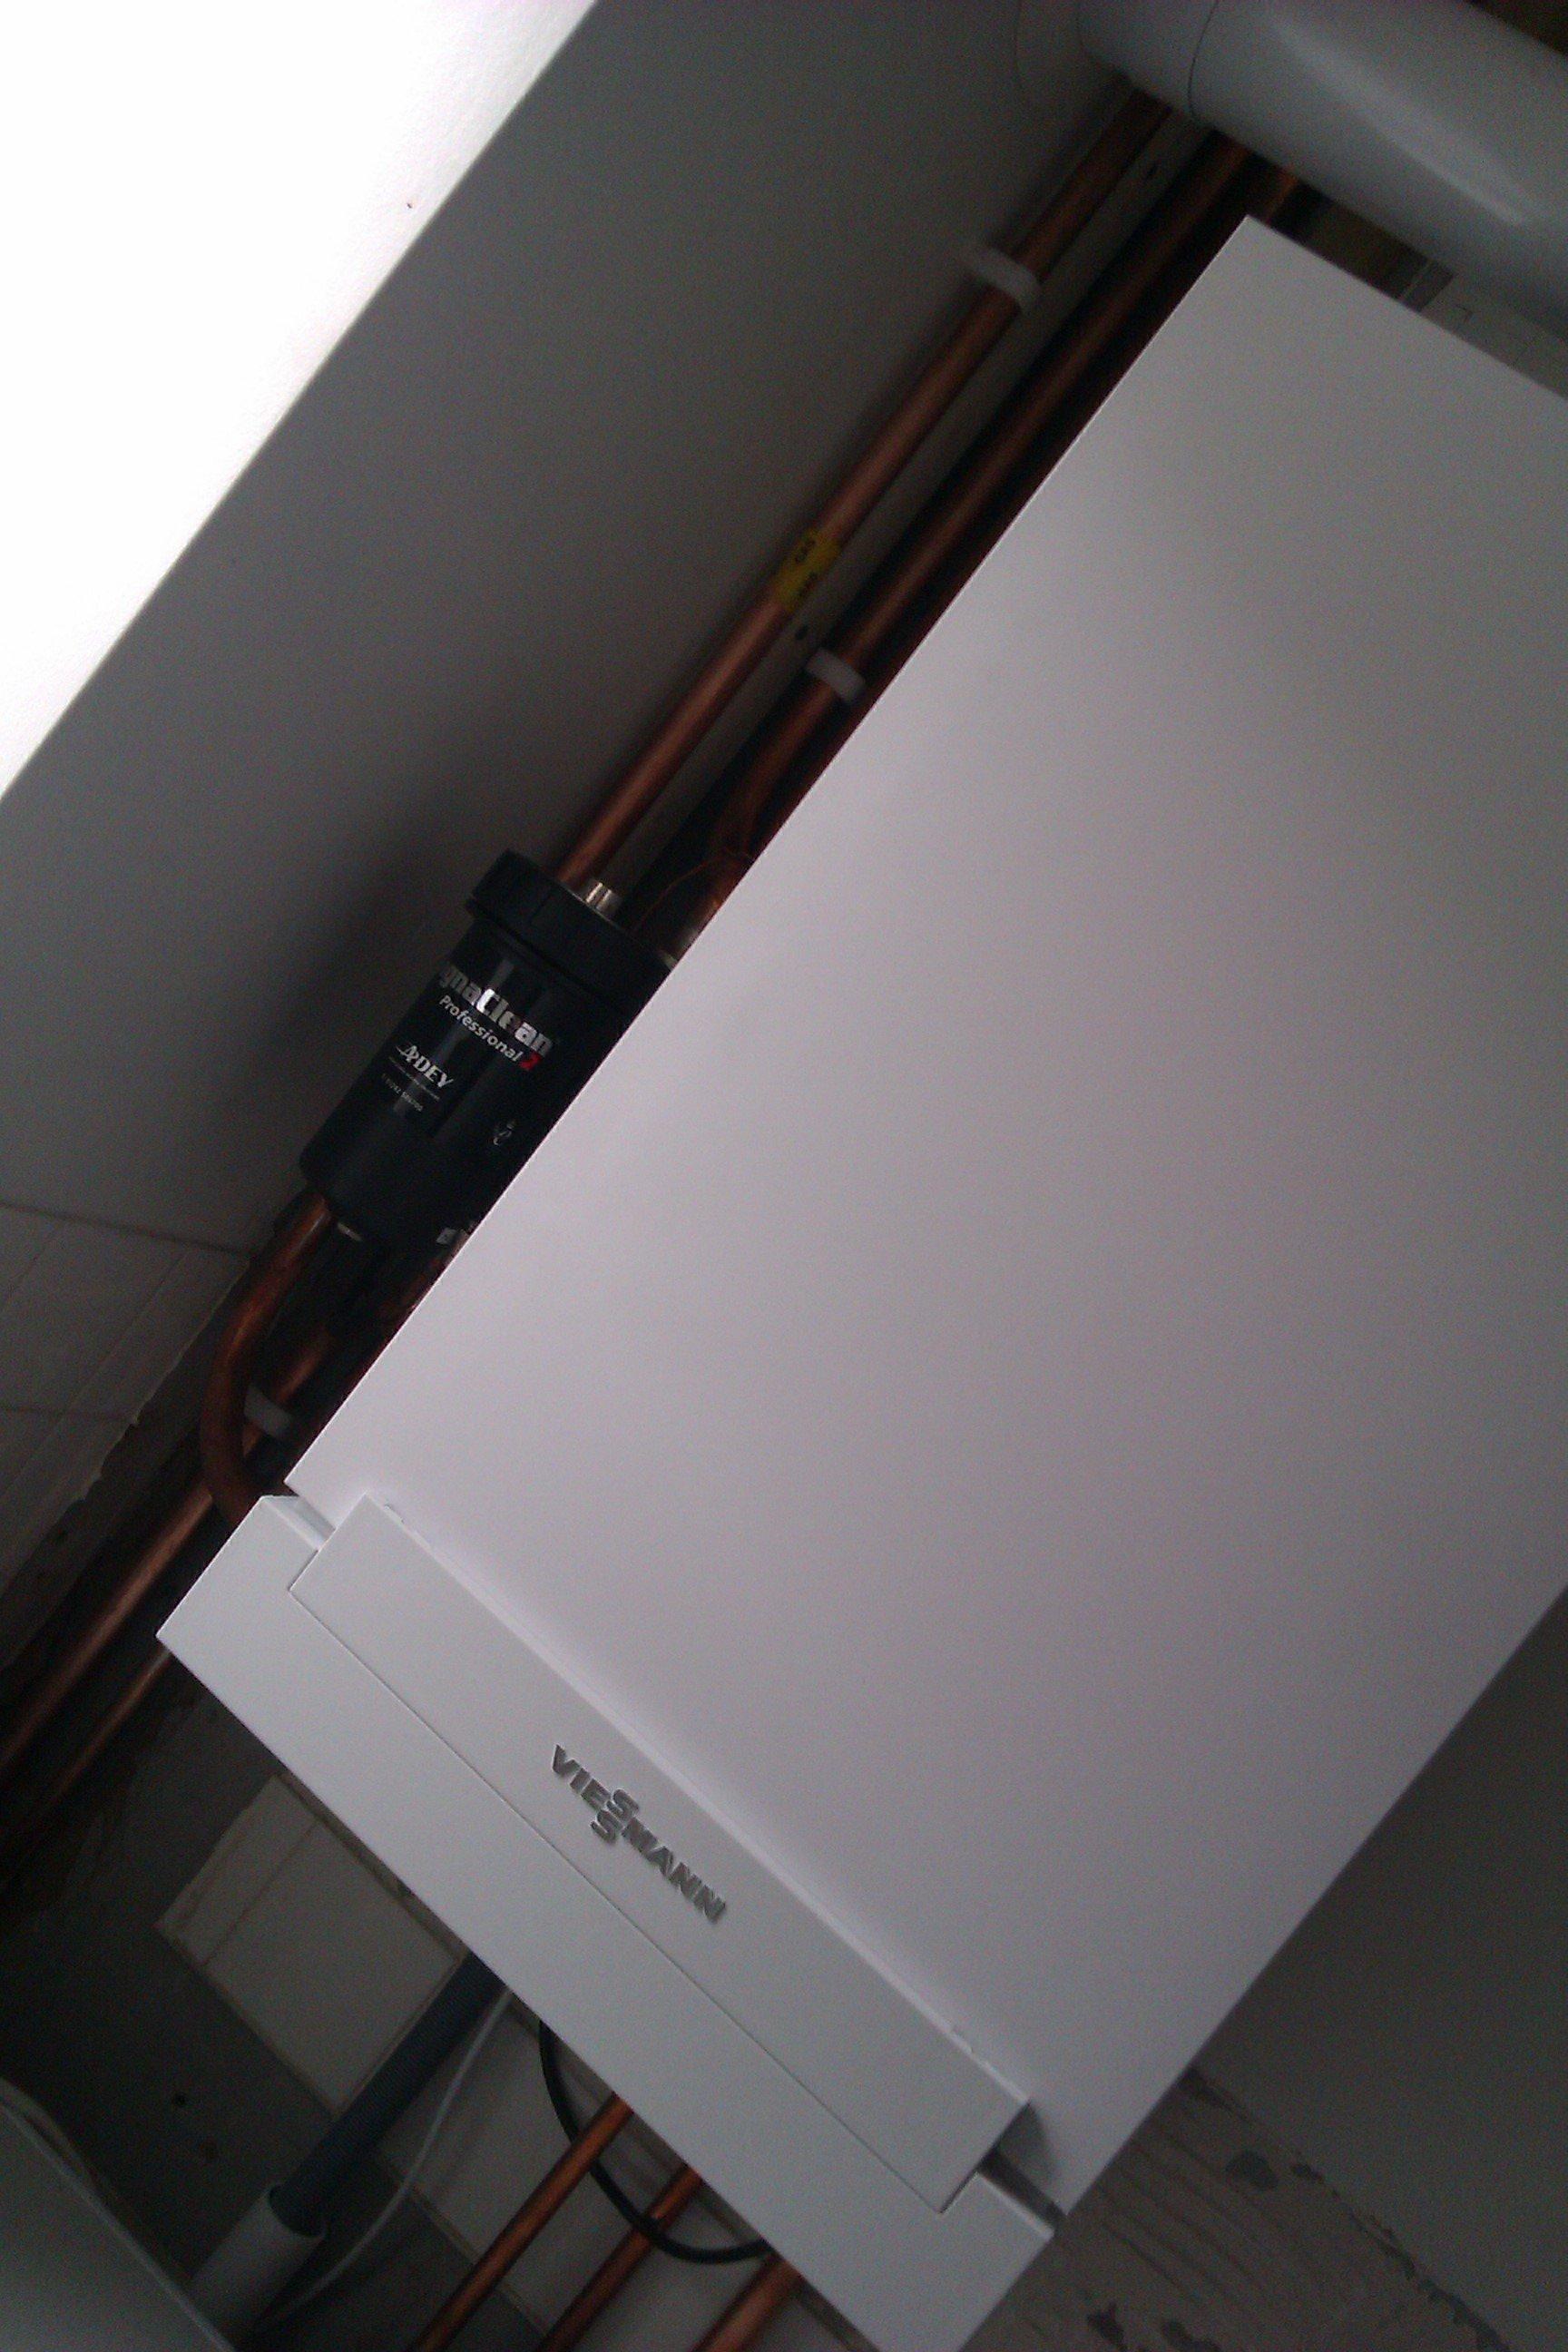 New Viessman combination boiler